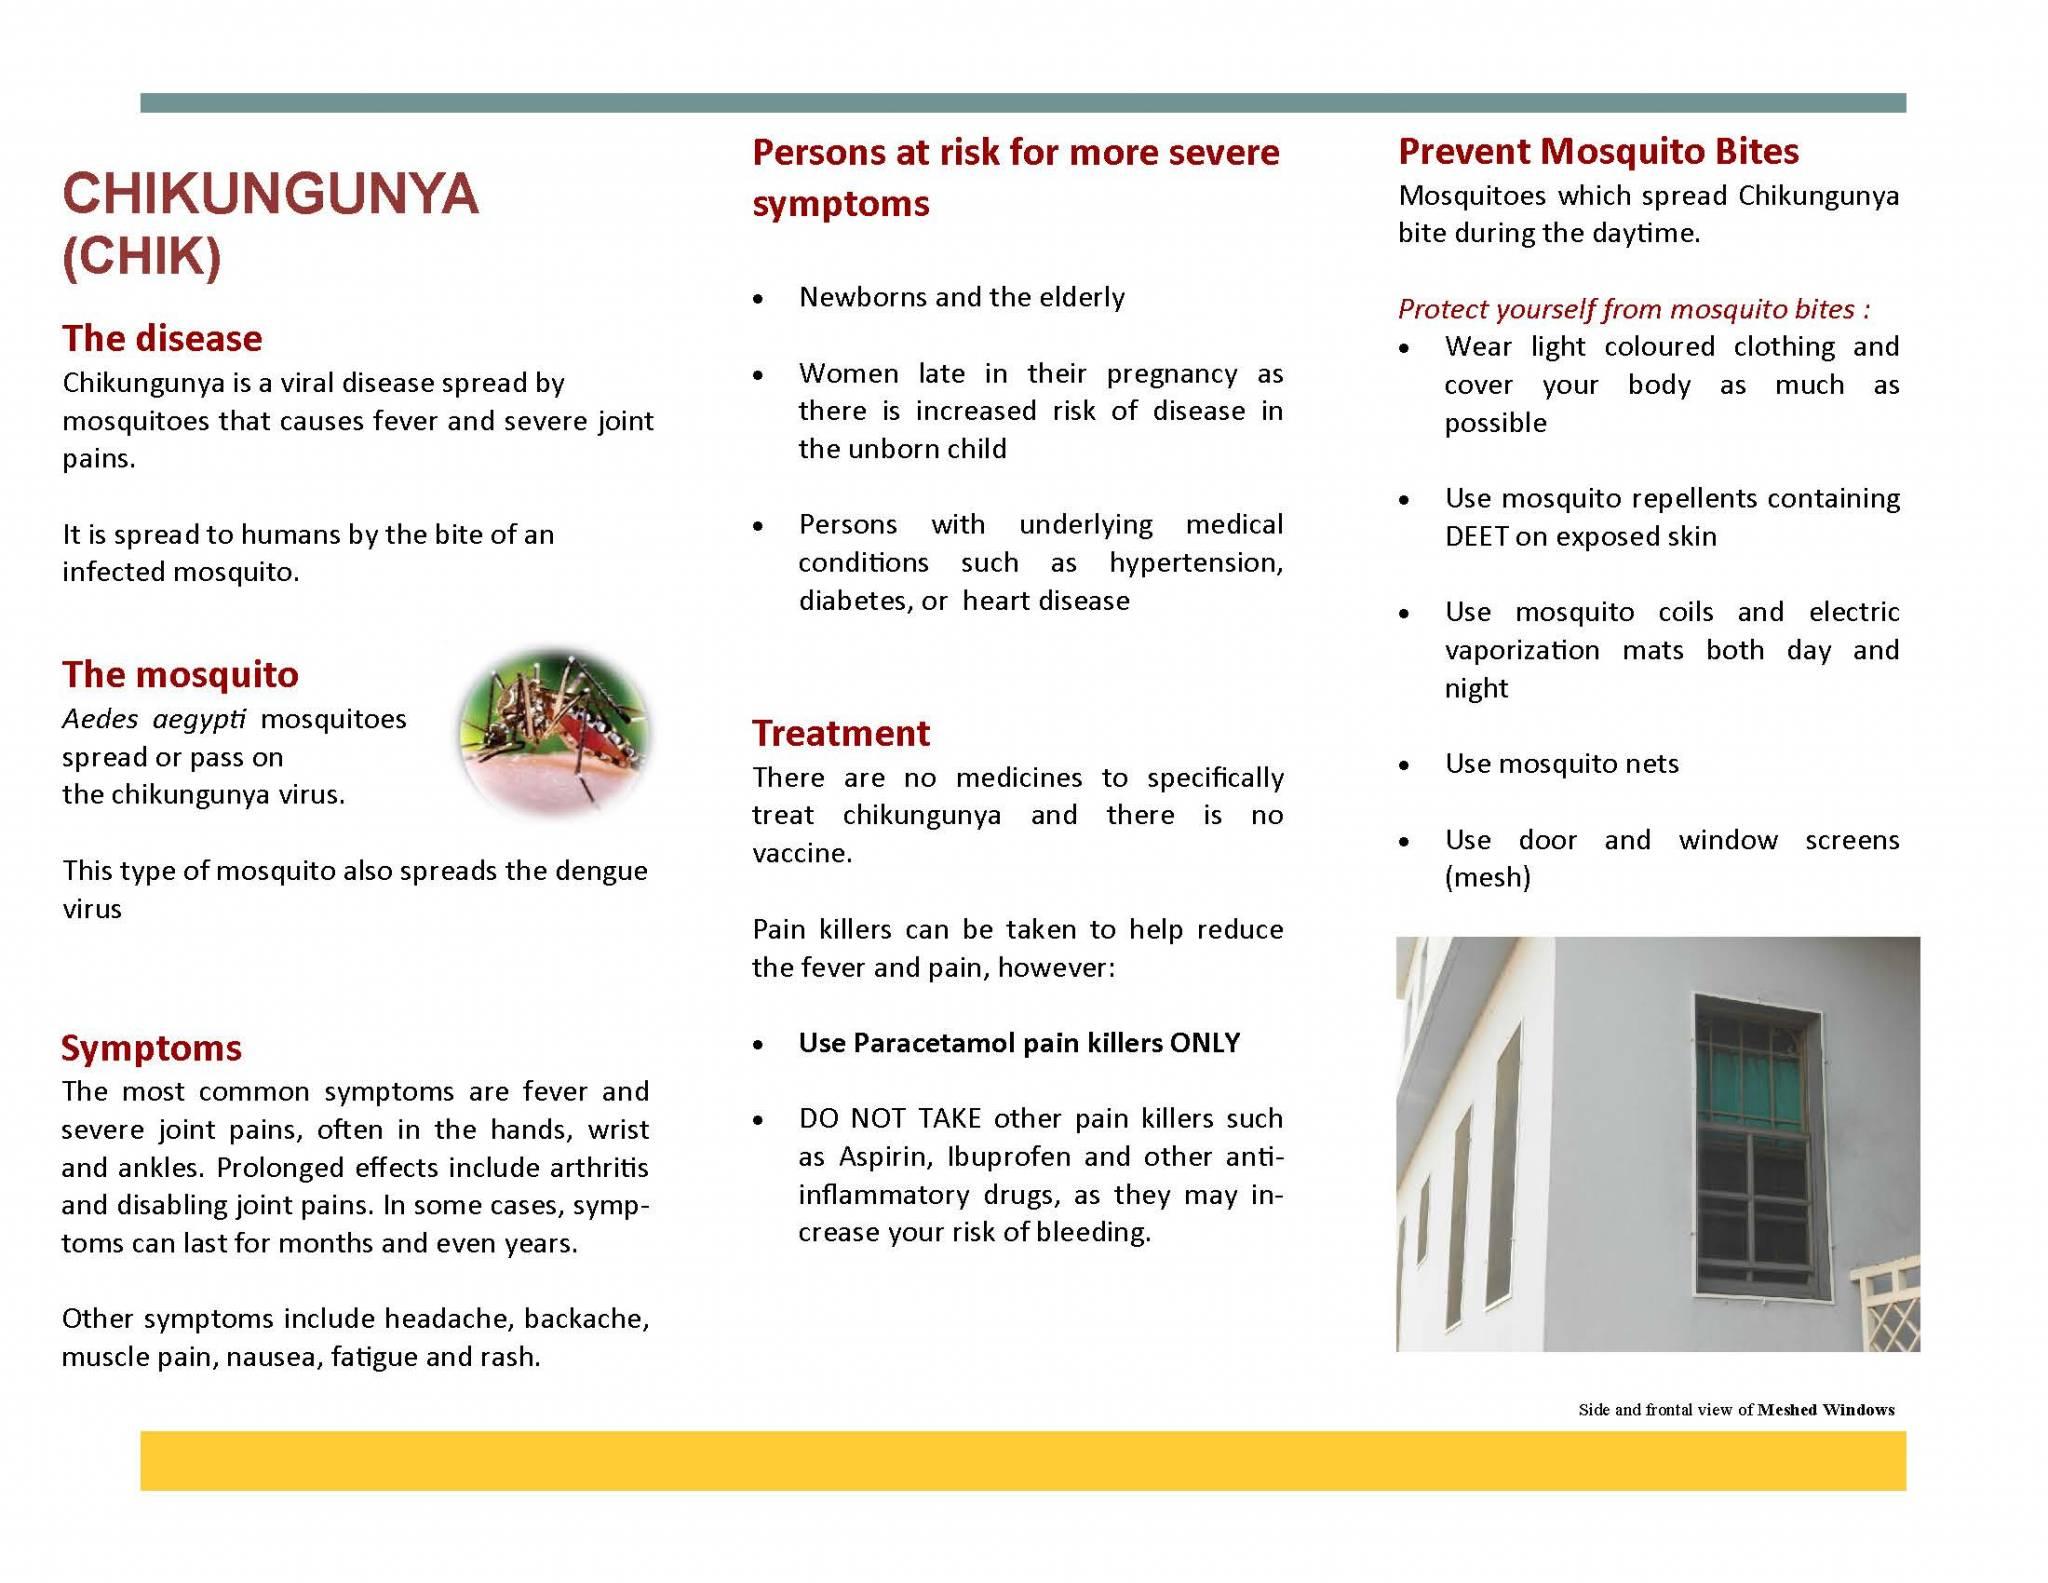 CHIK Brochure final version July 23_2014 (2)_Page_2